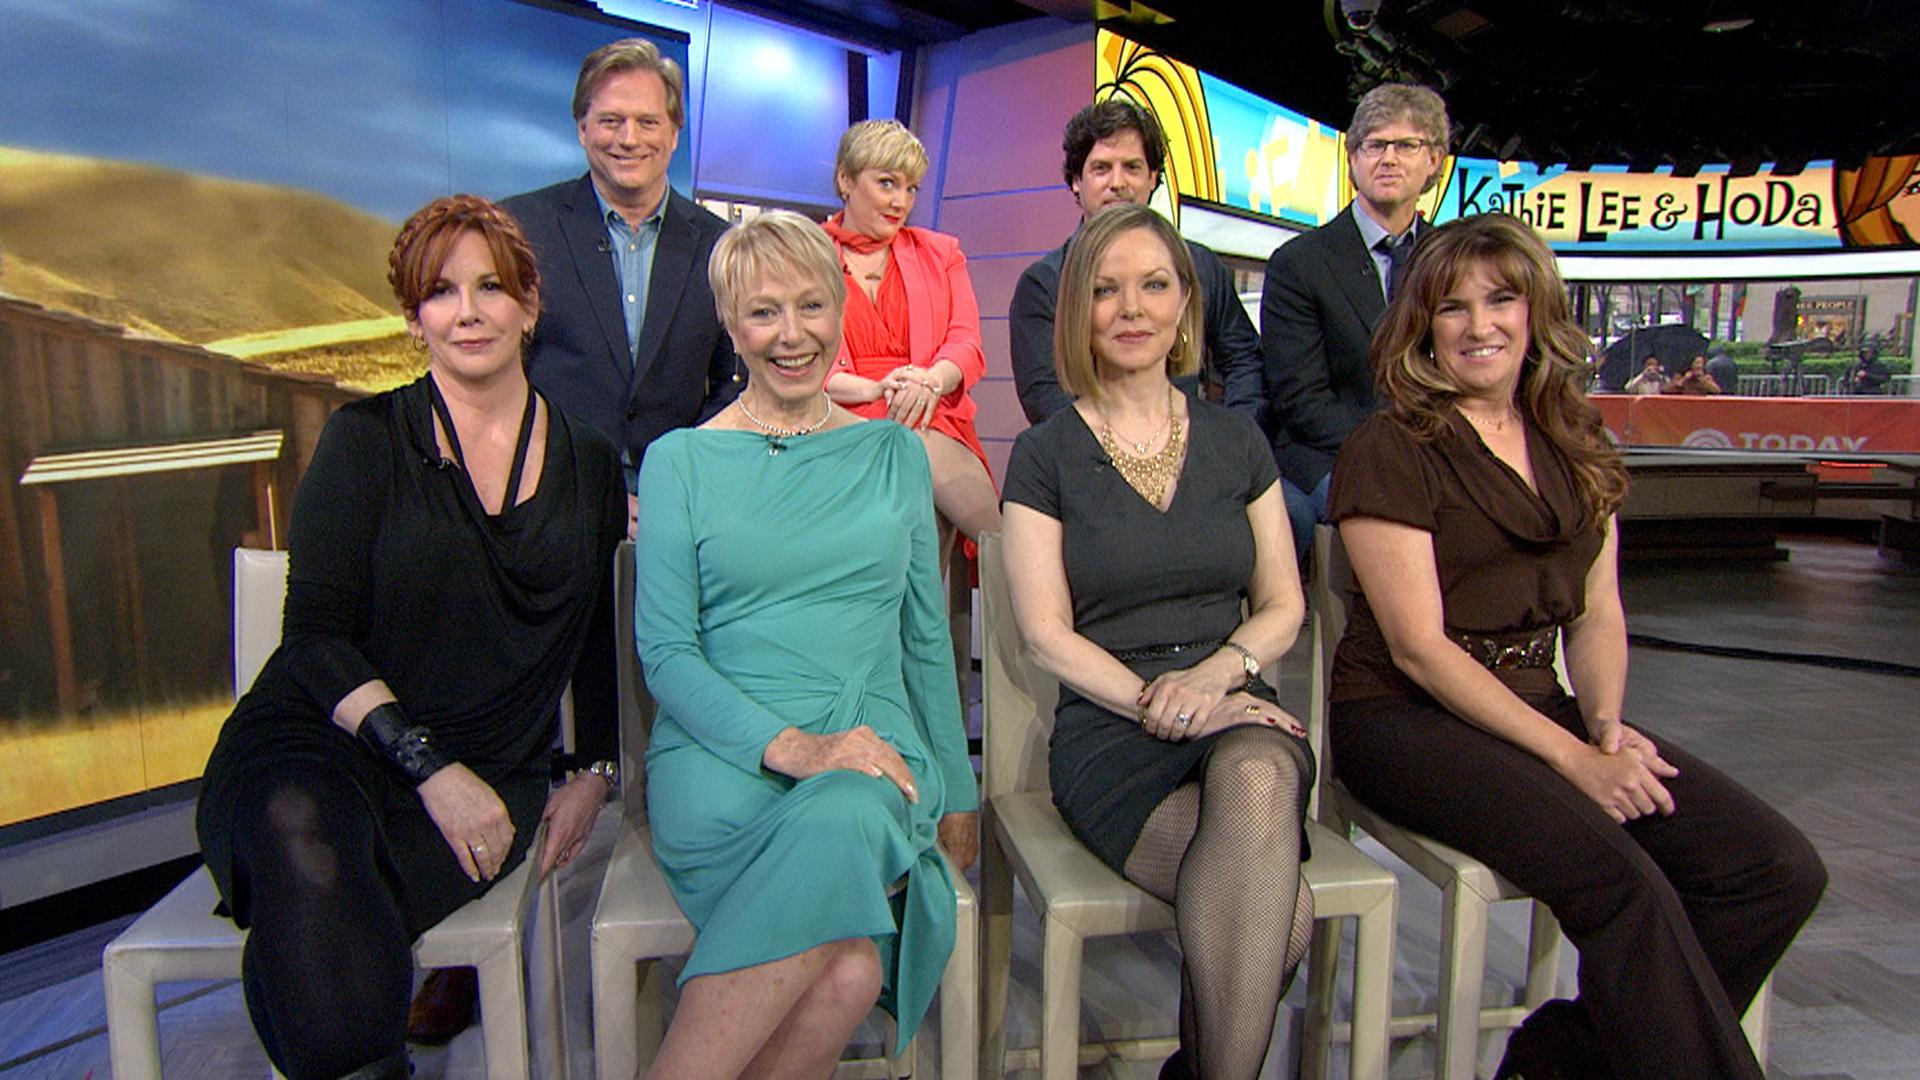 Garage Fun Cast : Little house on the prairie cast sheds tears talks